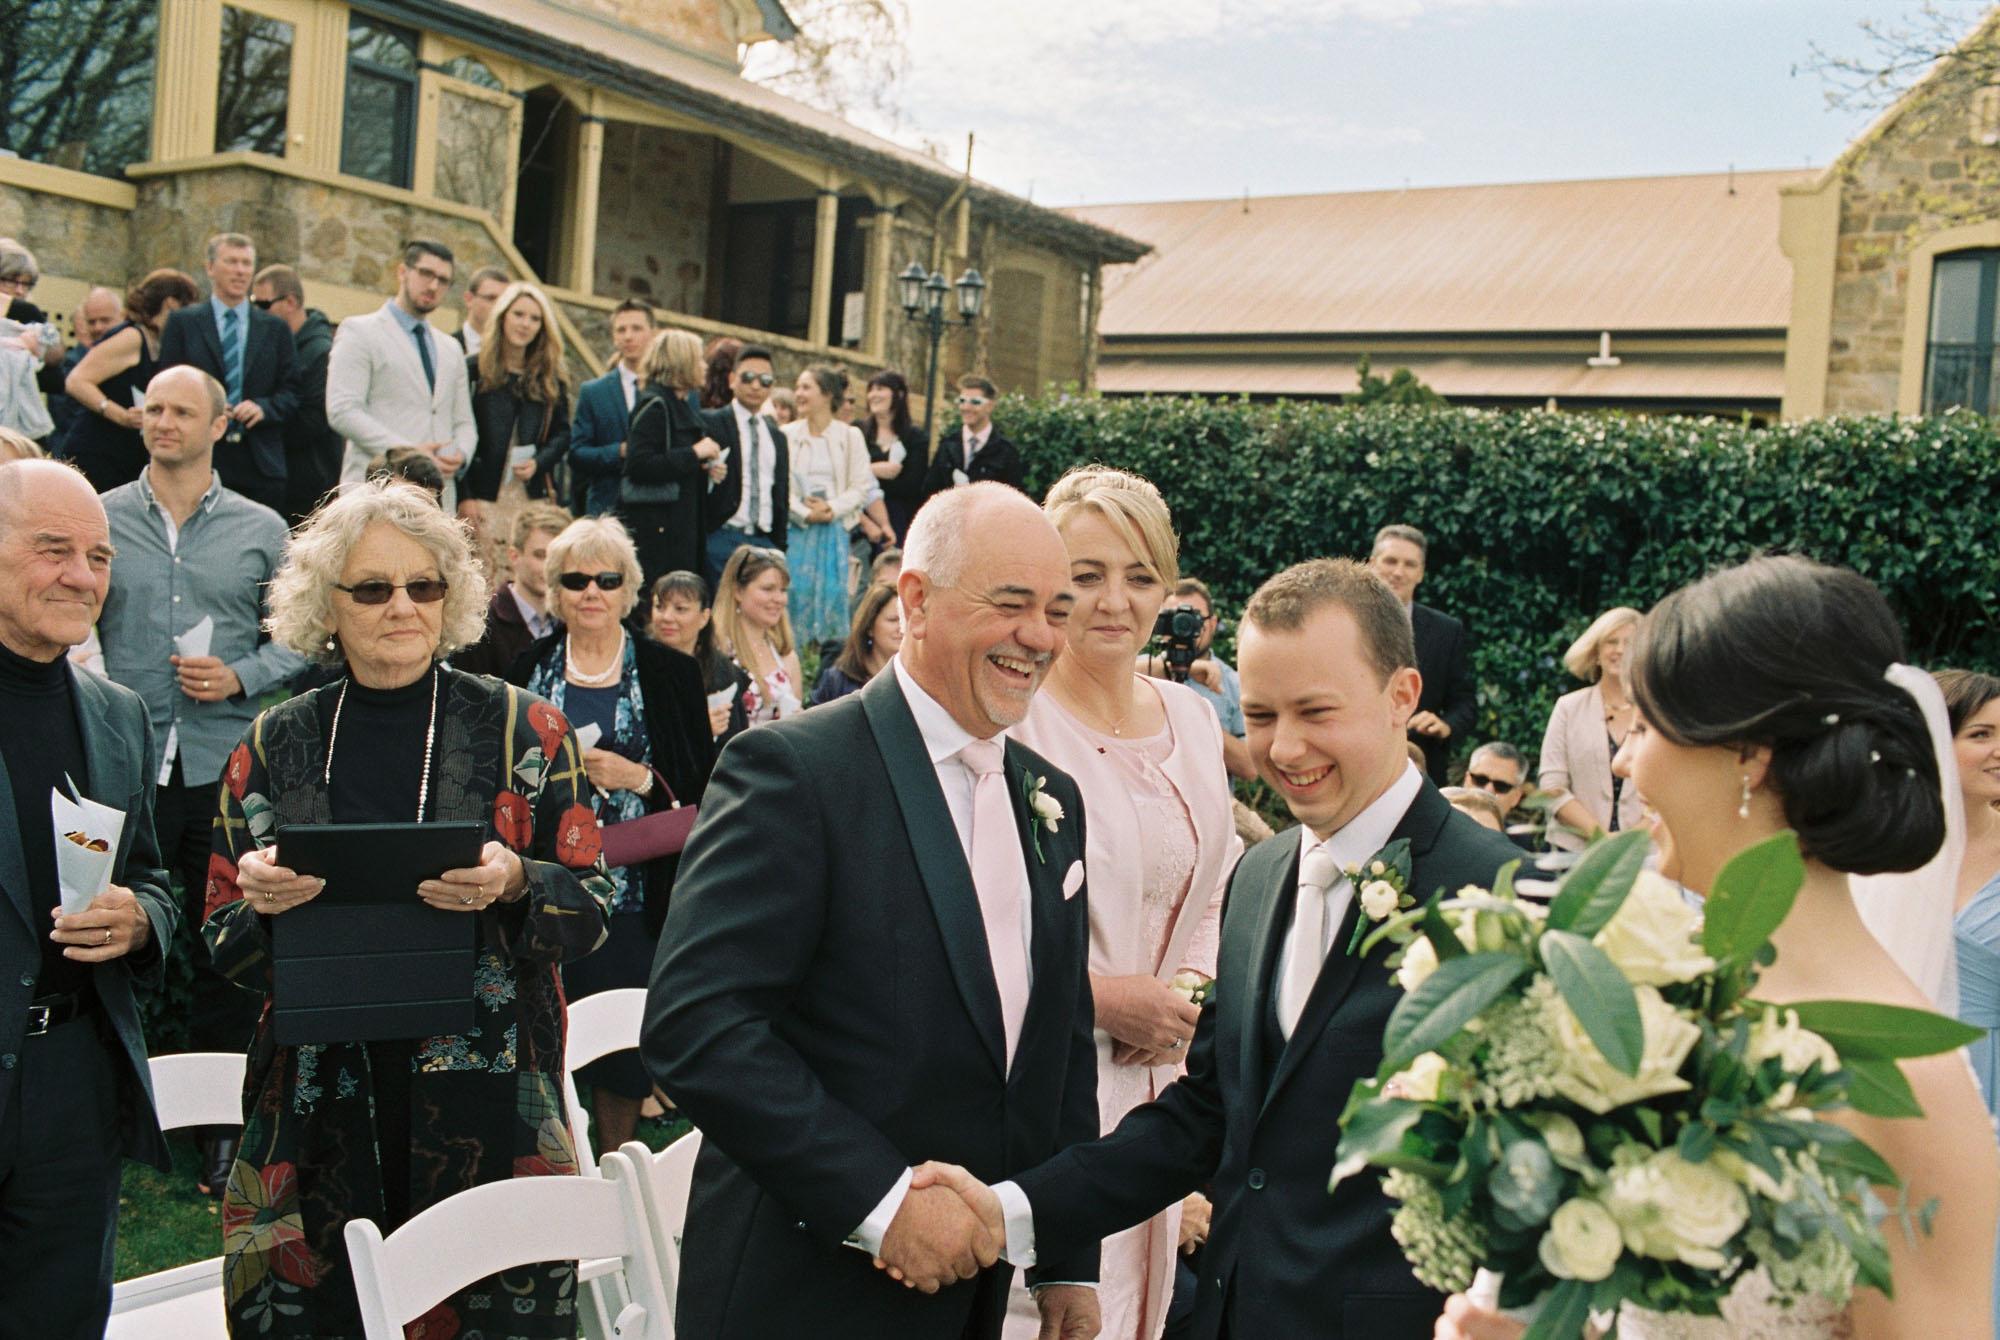 Mount-Lofty-House-wedding-photography-057.jpg